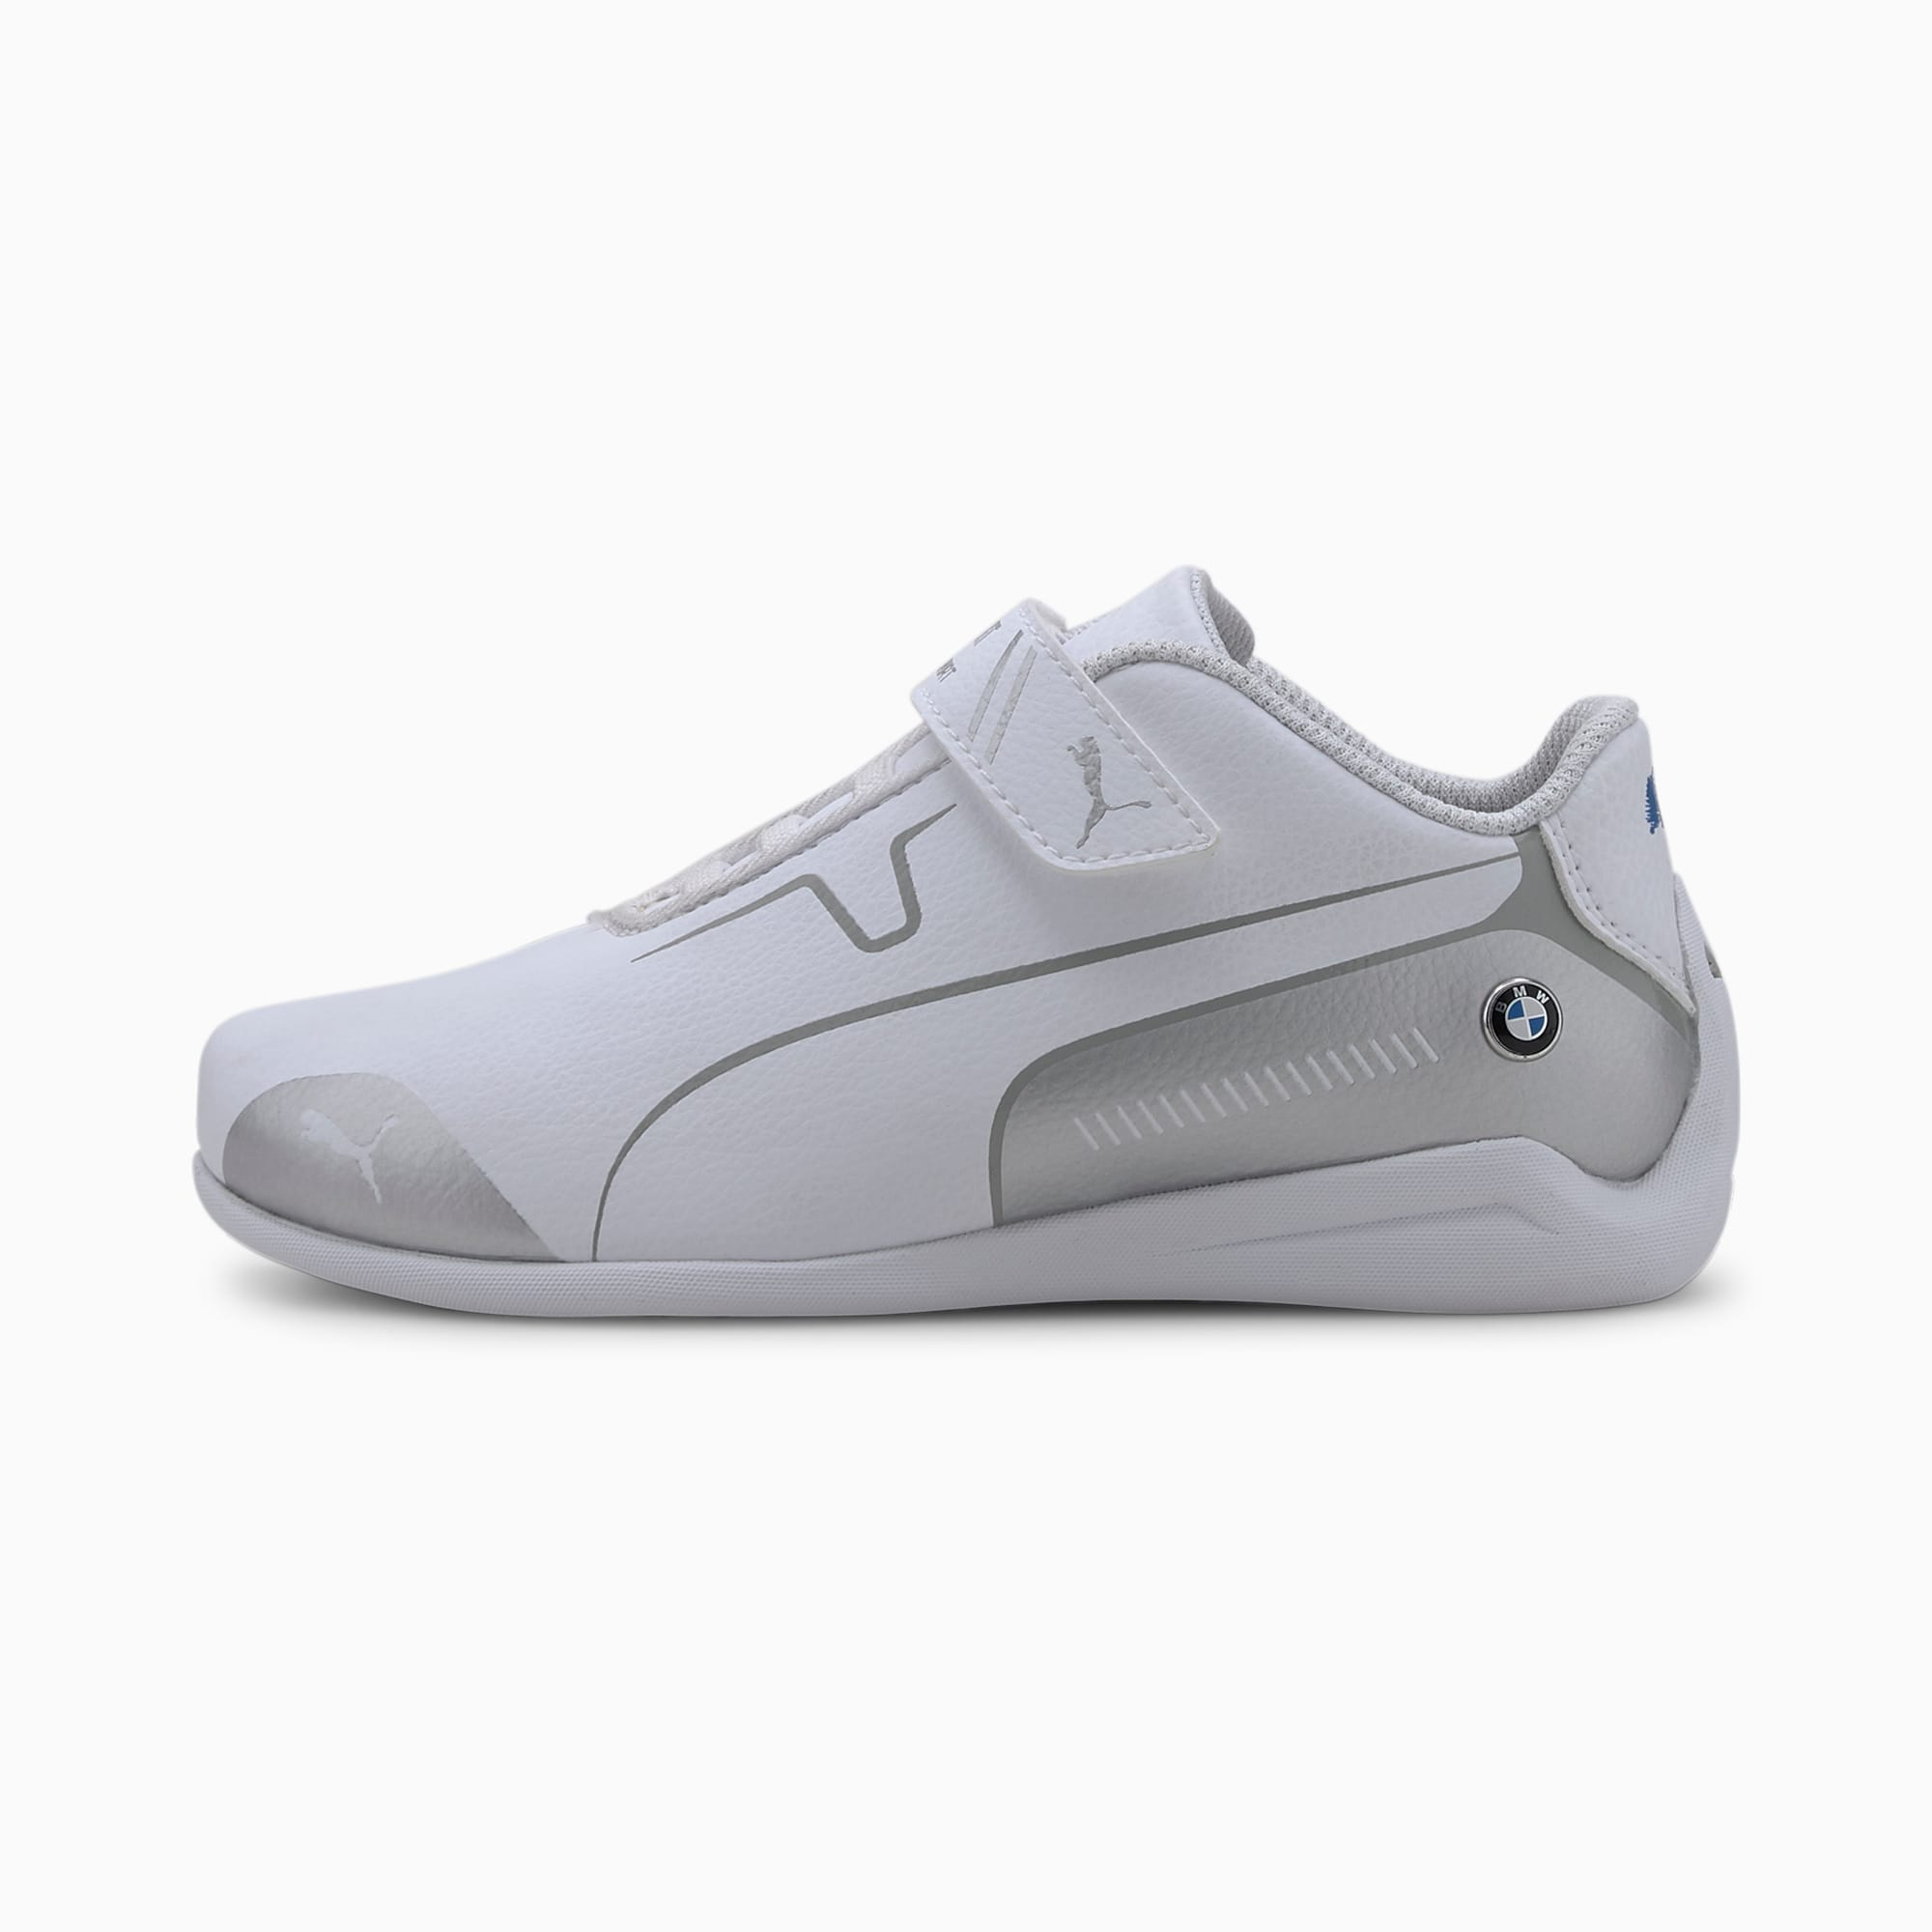 chaussure puma enfant 30